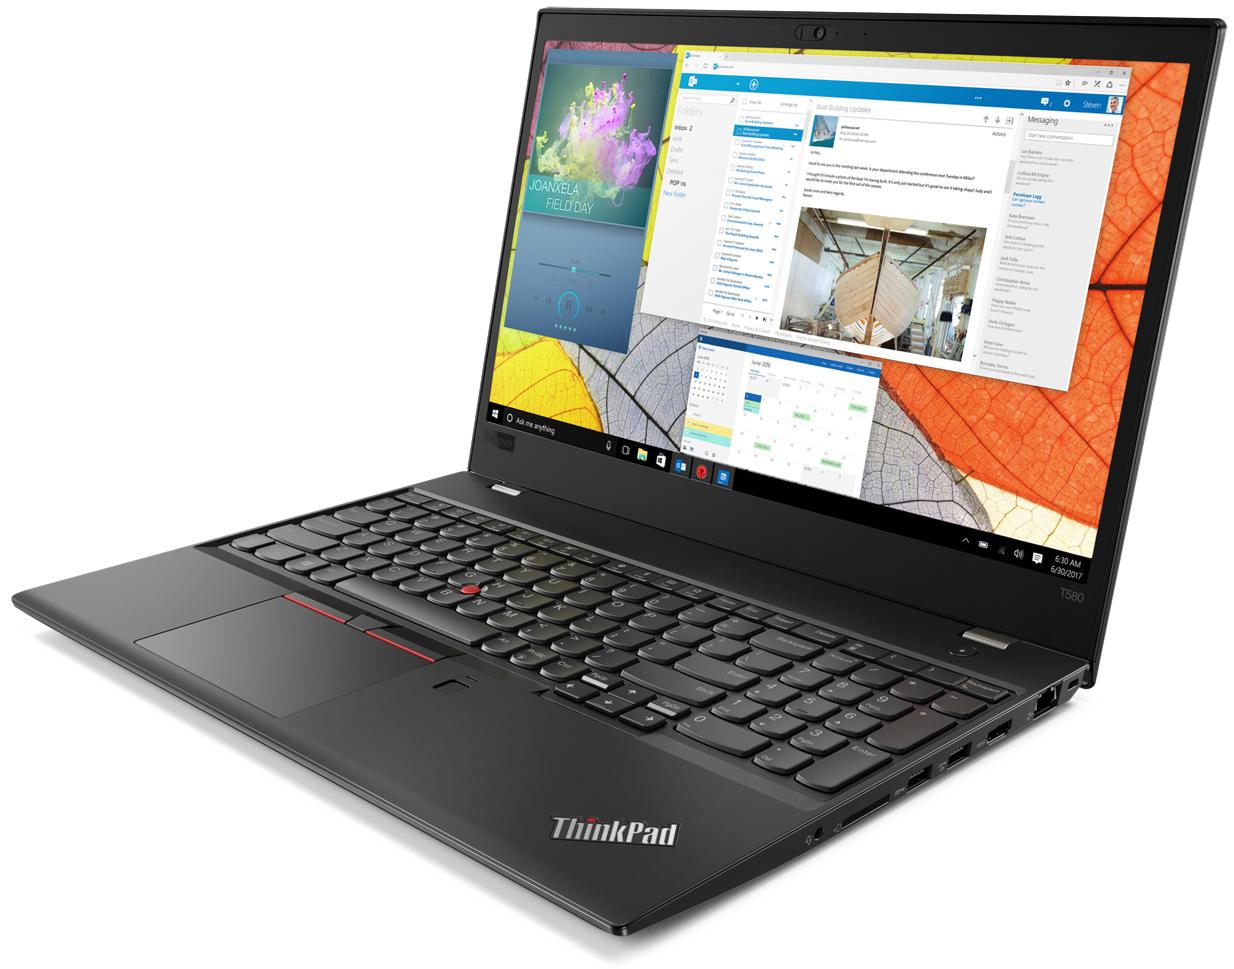 LENOVO ThinkPad T580 i7-8550U 15.6inch FHD LED 8GB 256GB SSD IntelUHD620 FIBOCOM L830 EB W10P 3YW